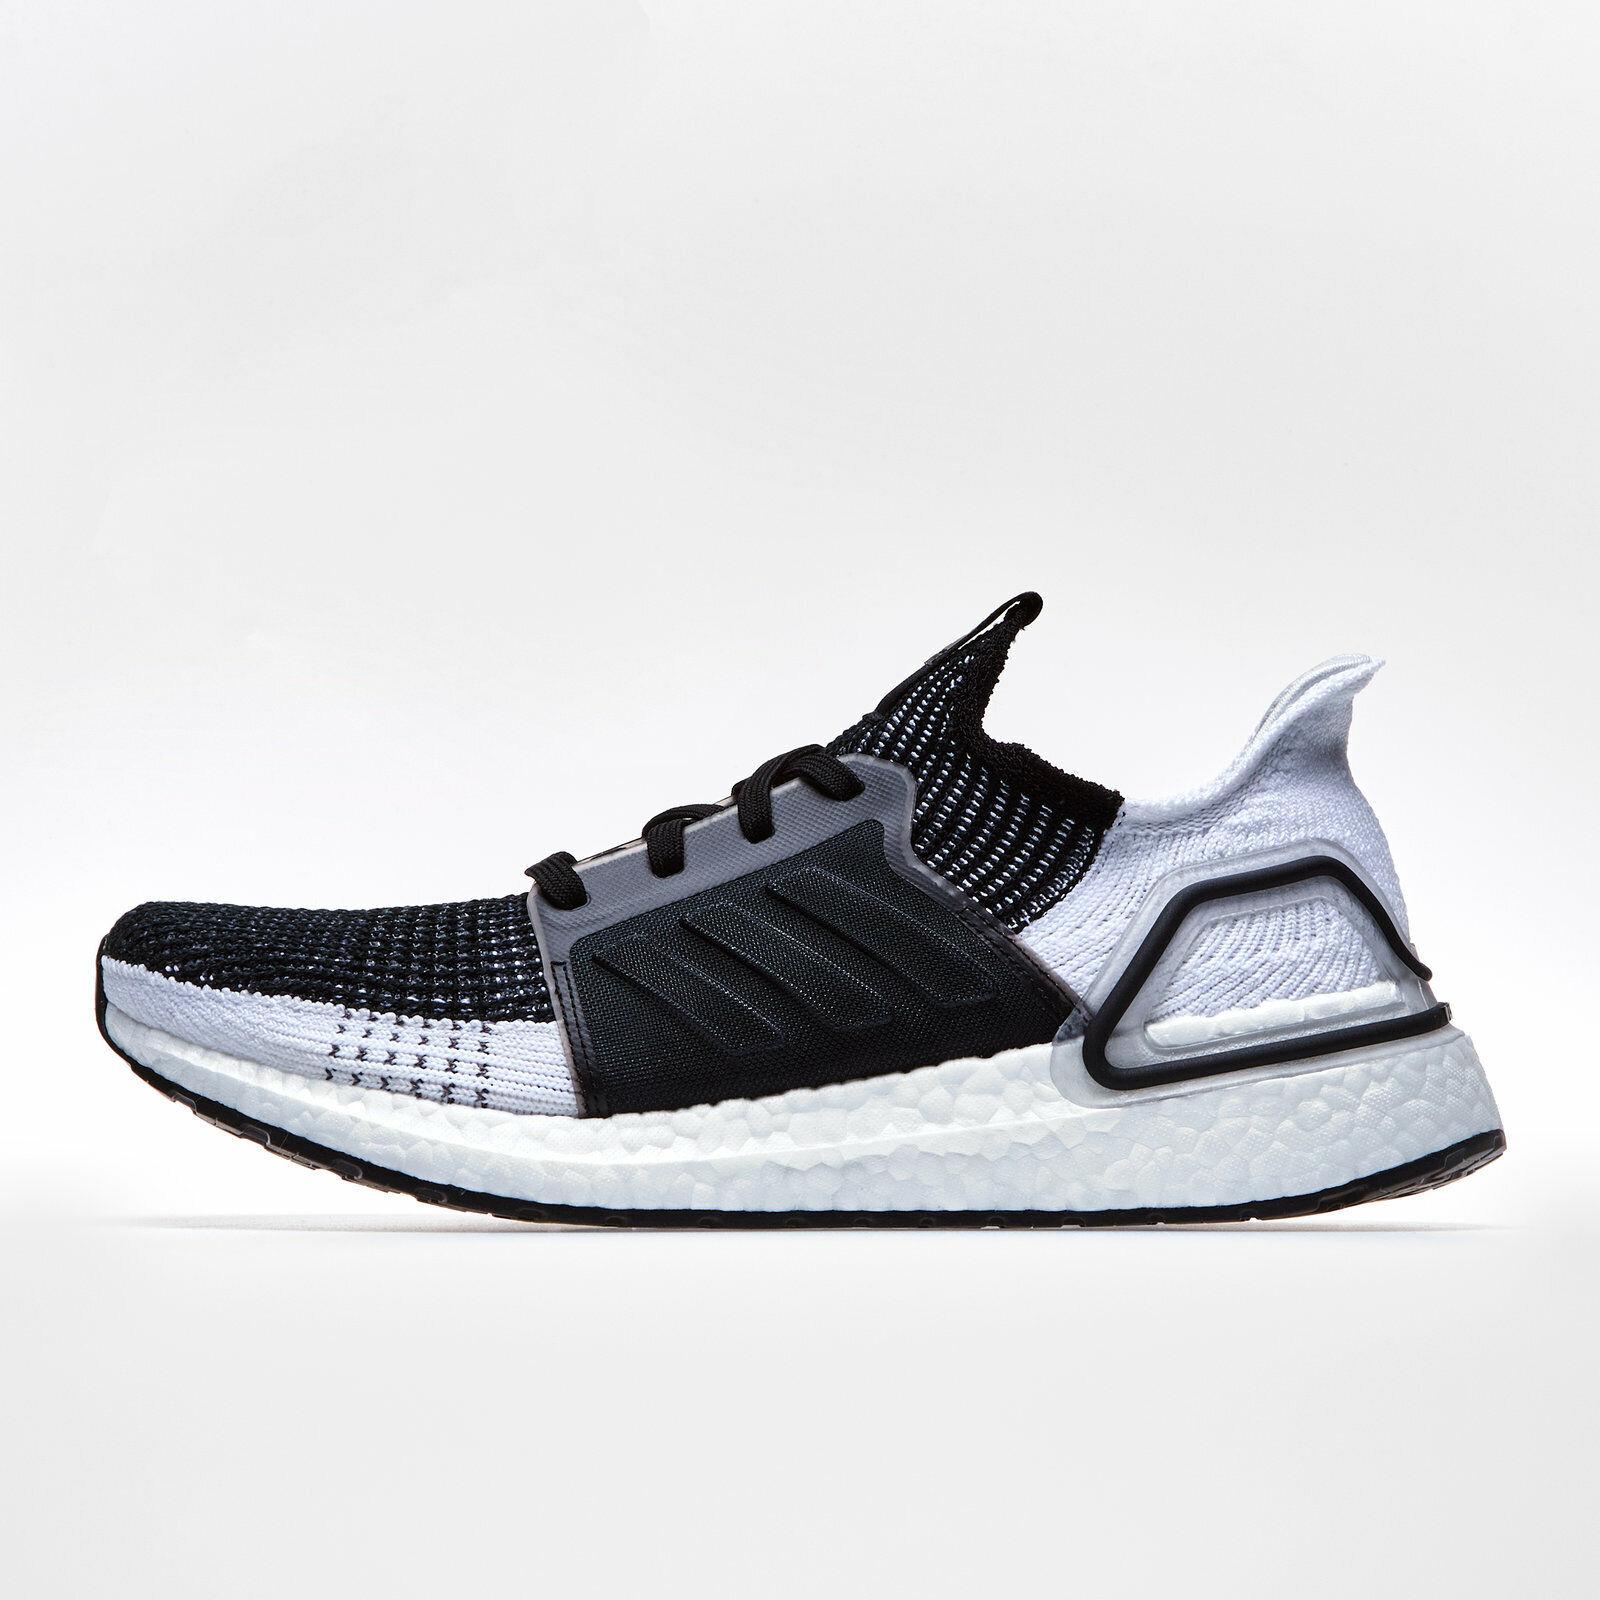 Adidas para mujer Ultra Boost 19 Damas Zapatillas Calzado Deportivo Zapatillas Negro